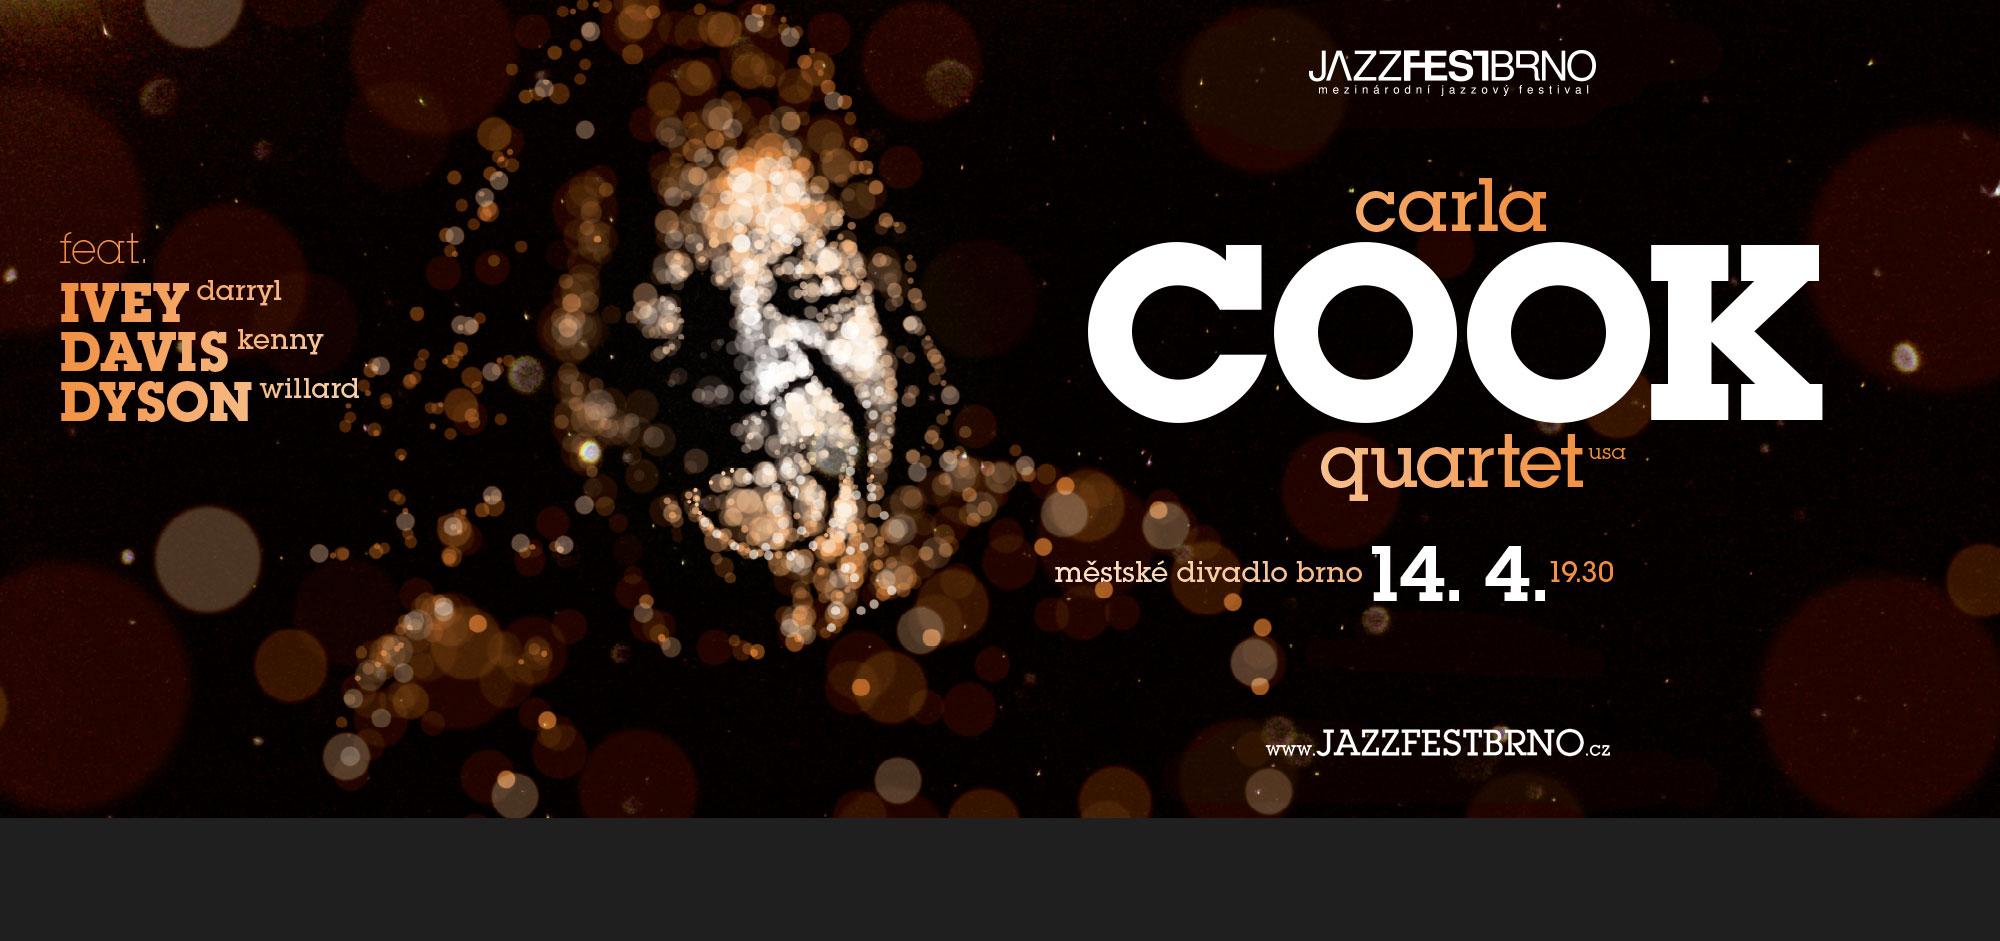 JazzFestBrno 2011 – Carla Cook